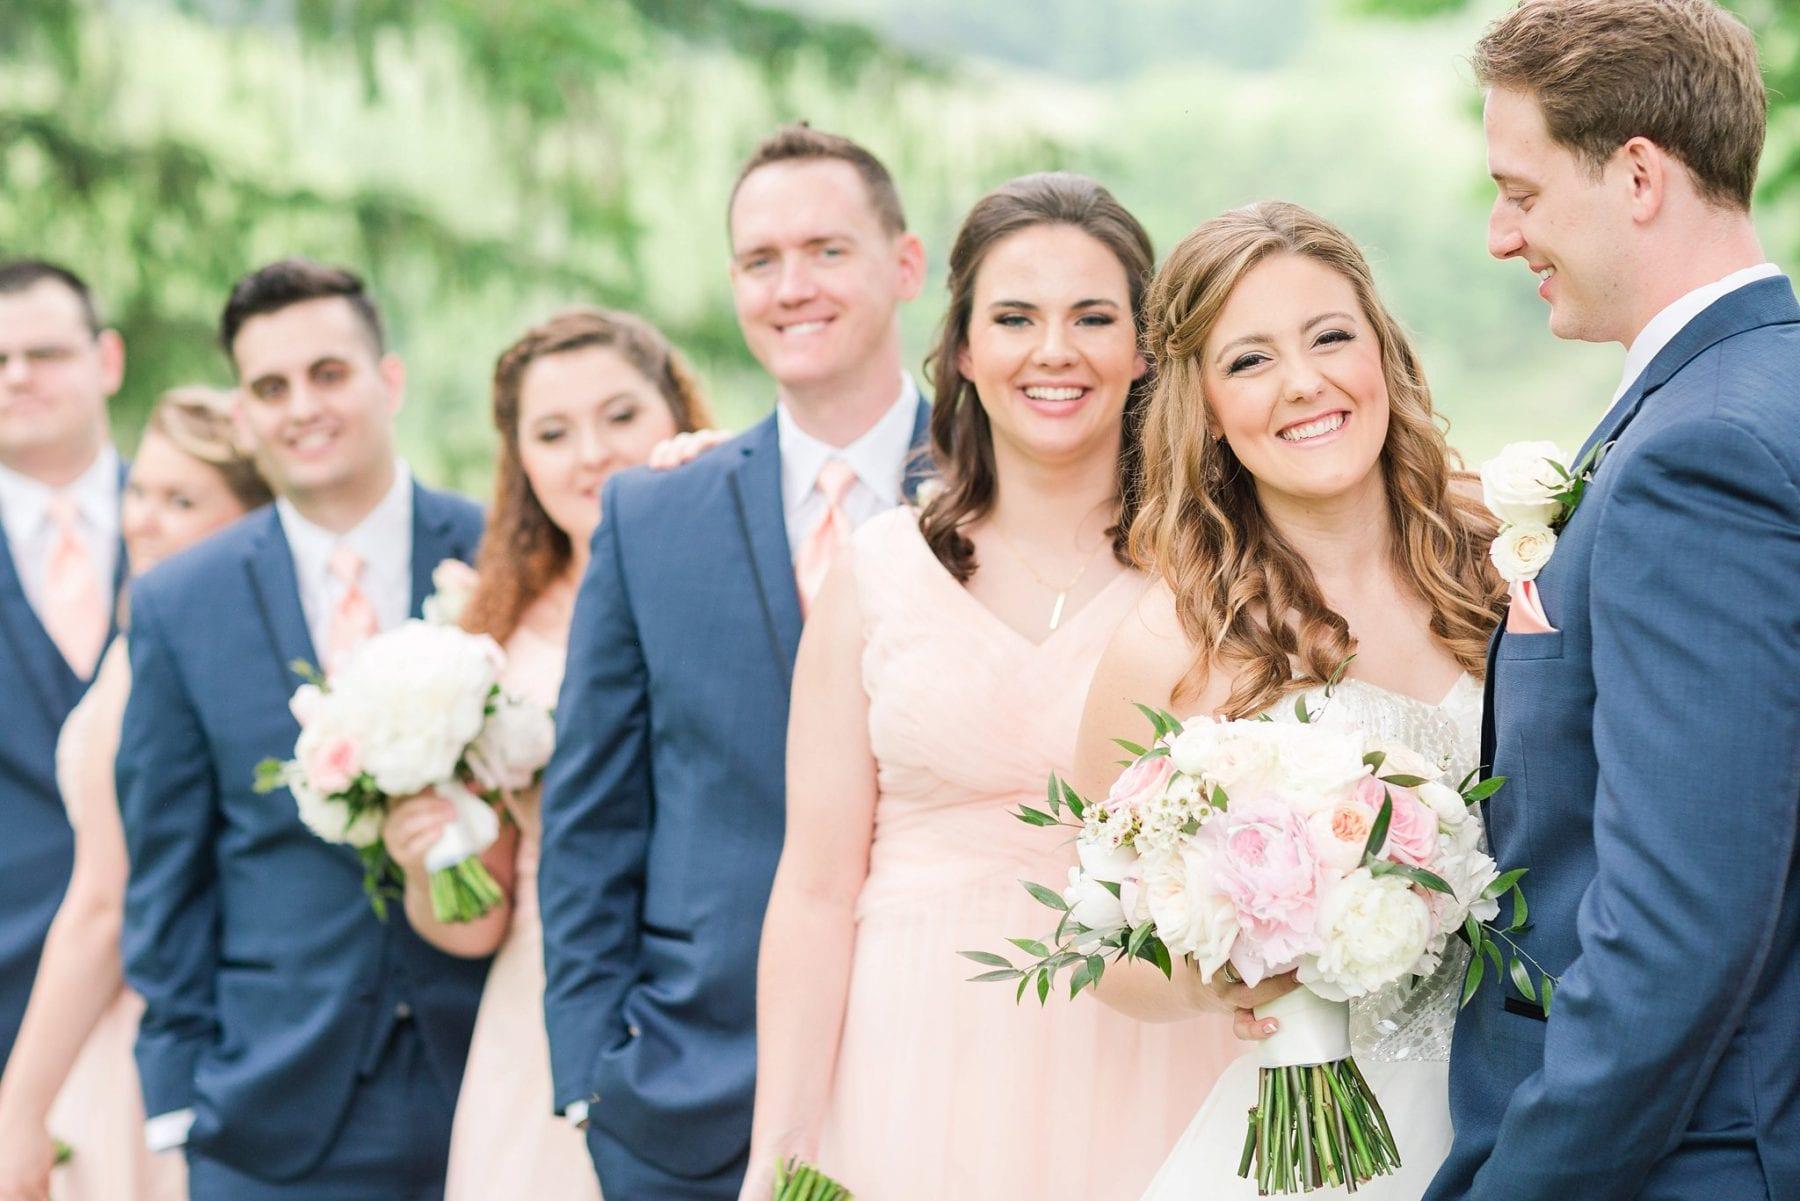 Justin & Megan Big Spring Farm Wedding Photos-140.jpg